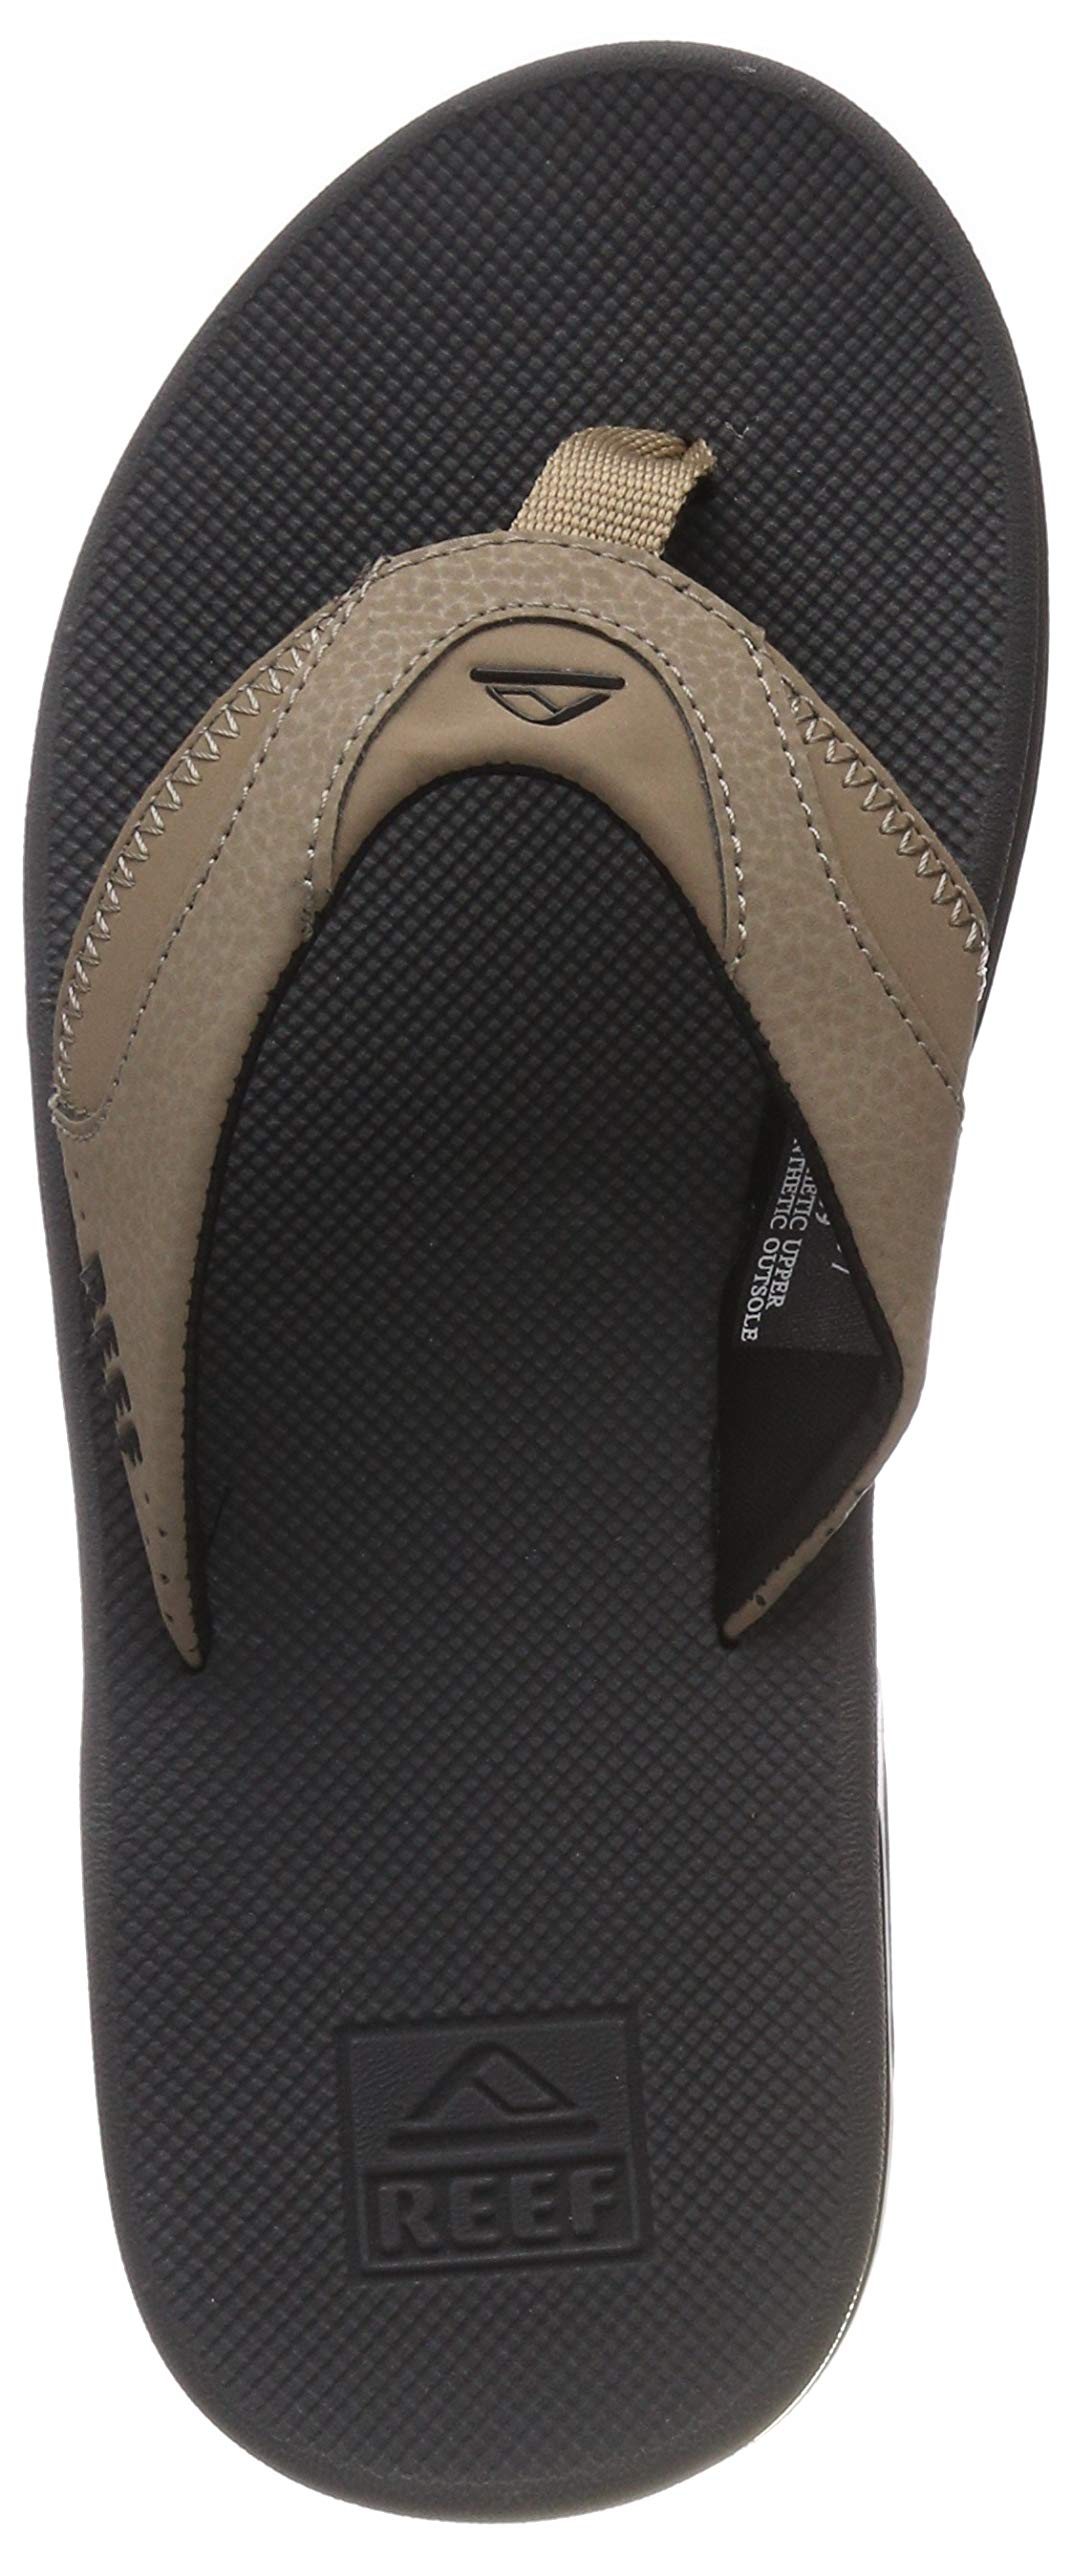 Reef Fanning Mens Sandals Bottle Opener Flip Flops for Men,Tan/Black/Tan, 8 M US